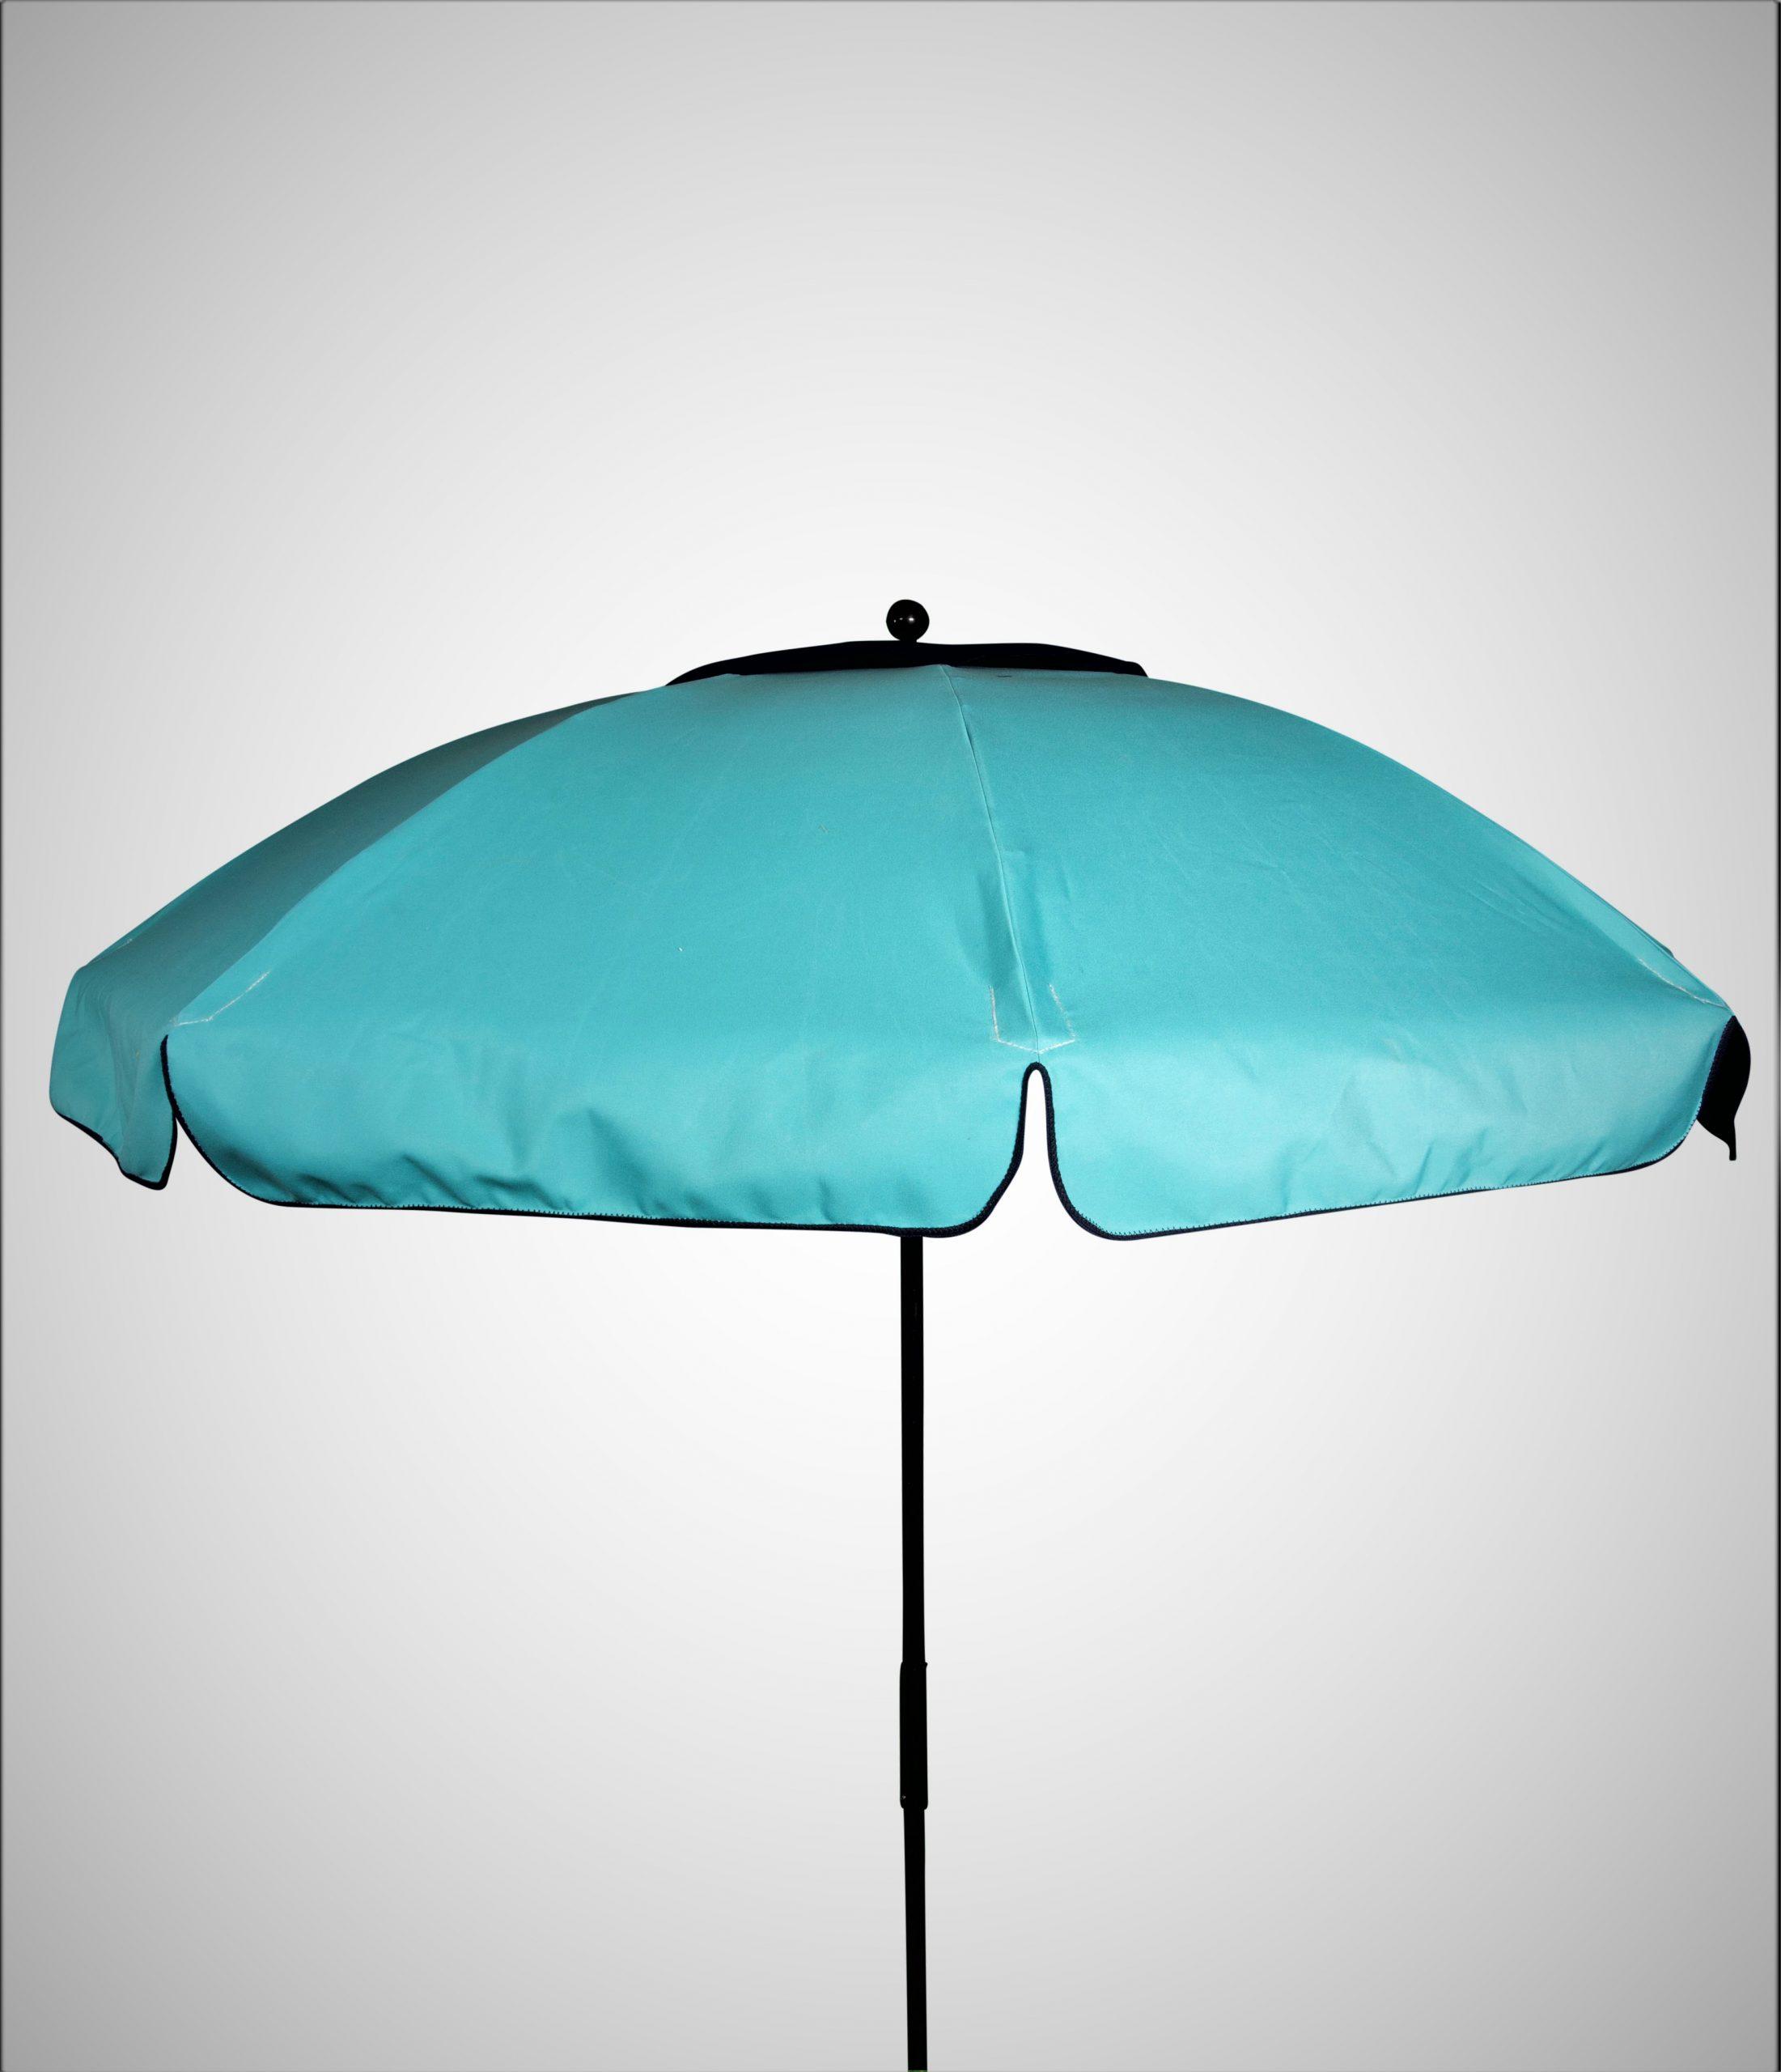 Light blue umbrella